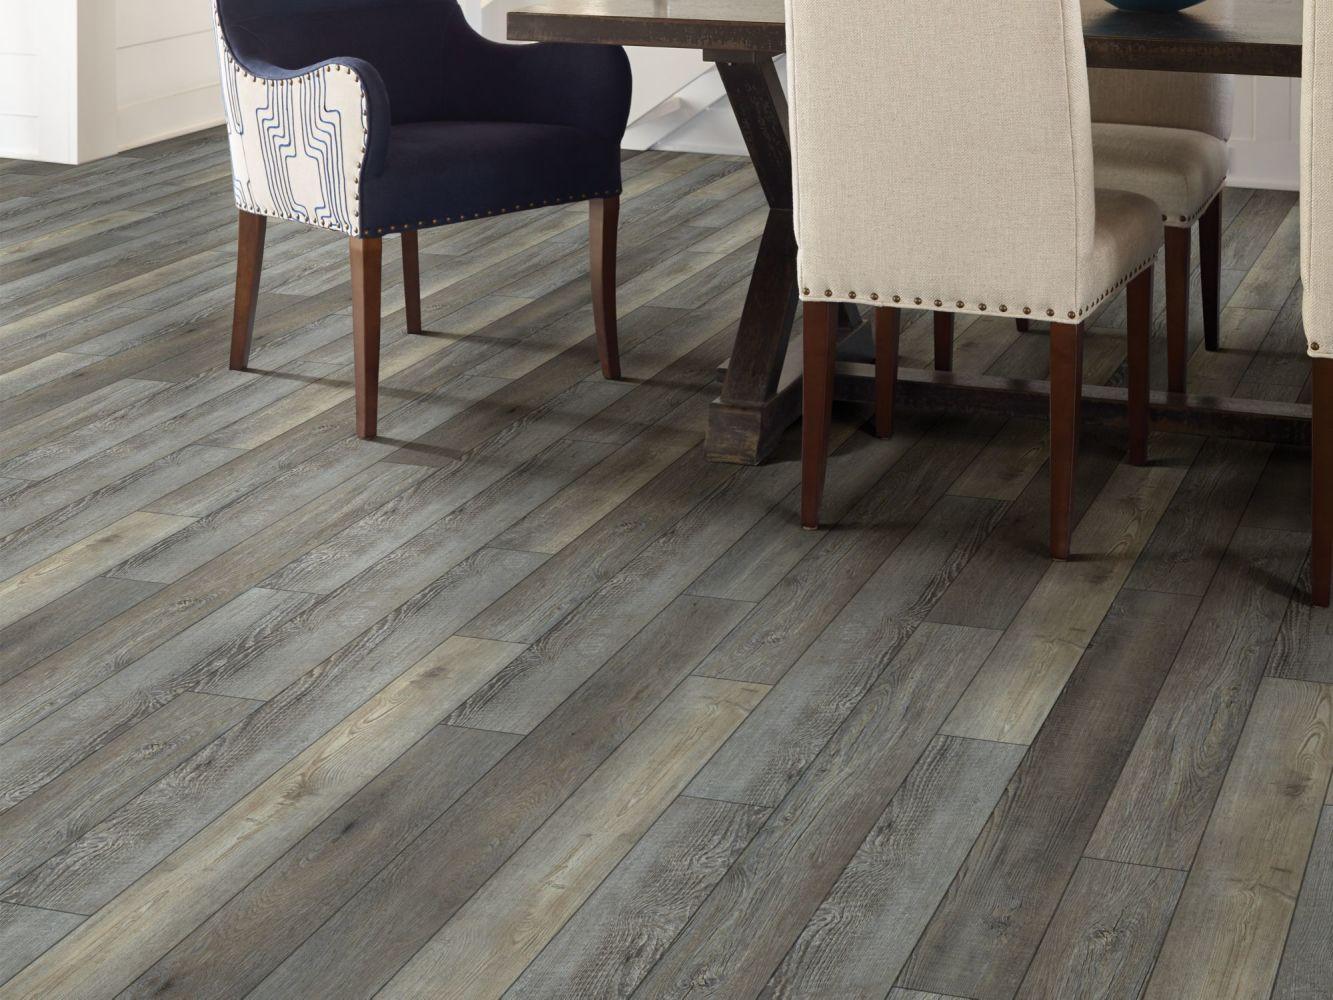 Shaw Floors Resilient Residential Paragon 5″ Plus Loft Pine 05047_1019V